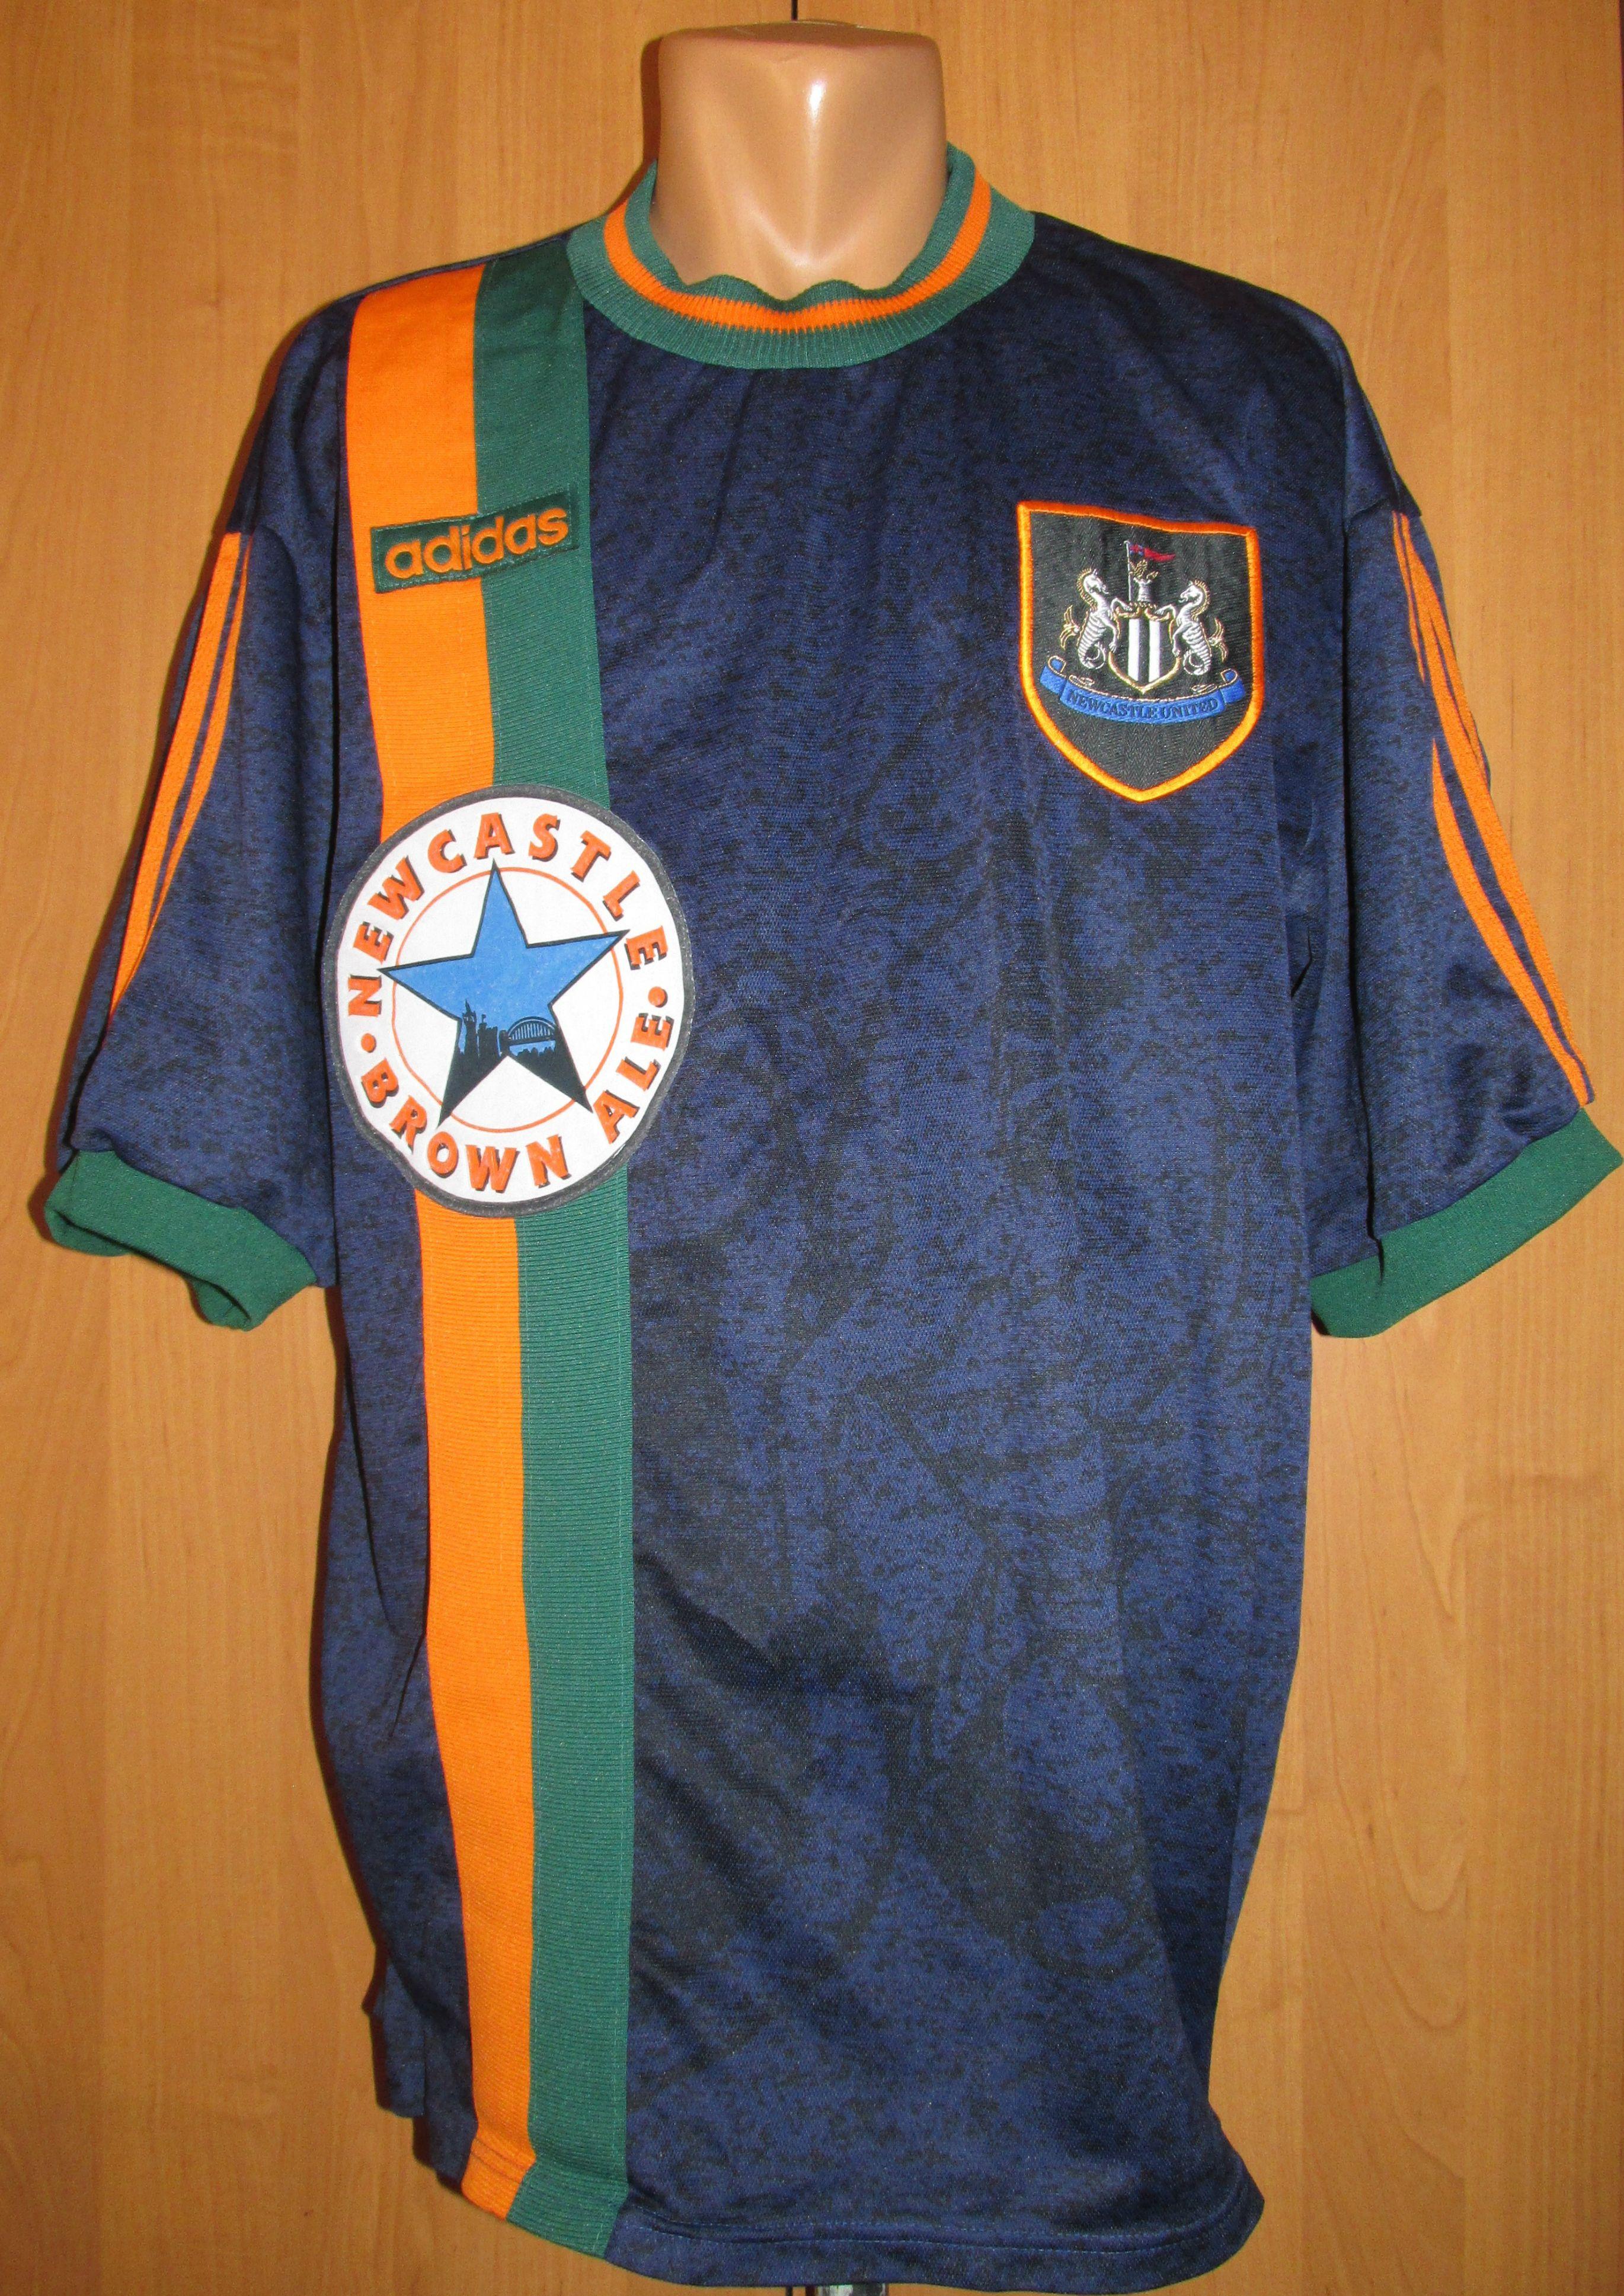 the best attitude 5452d f244c Newcastle united 1997/1998 away football shirt jersey ...